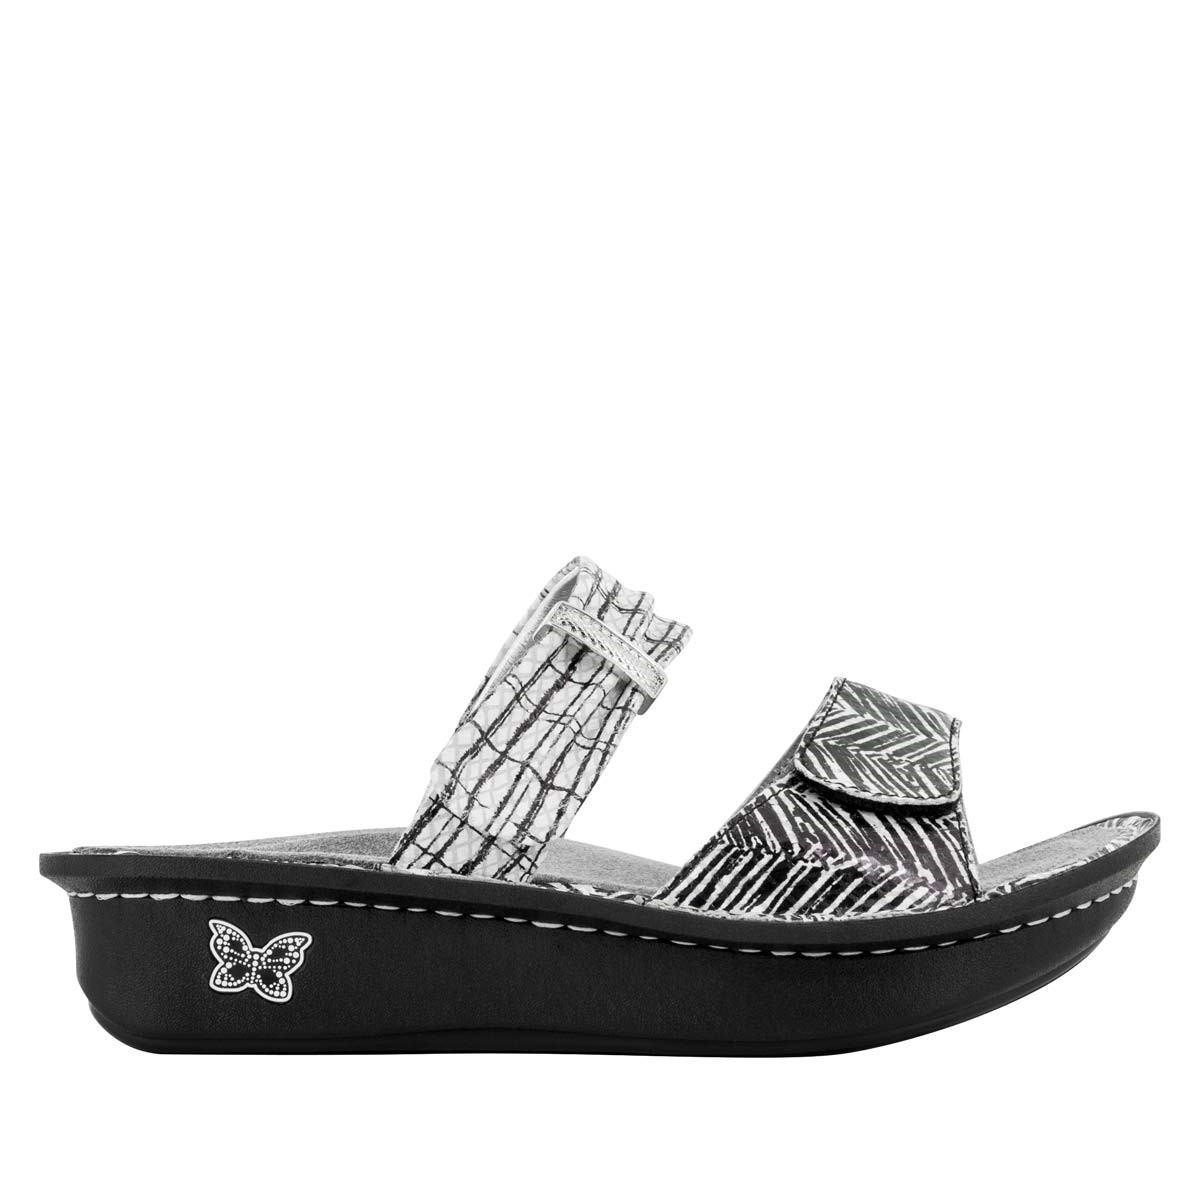 a98988f33 Karmen Unity Black   White - Alegria Shoes